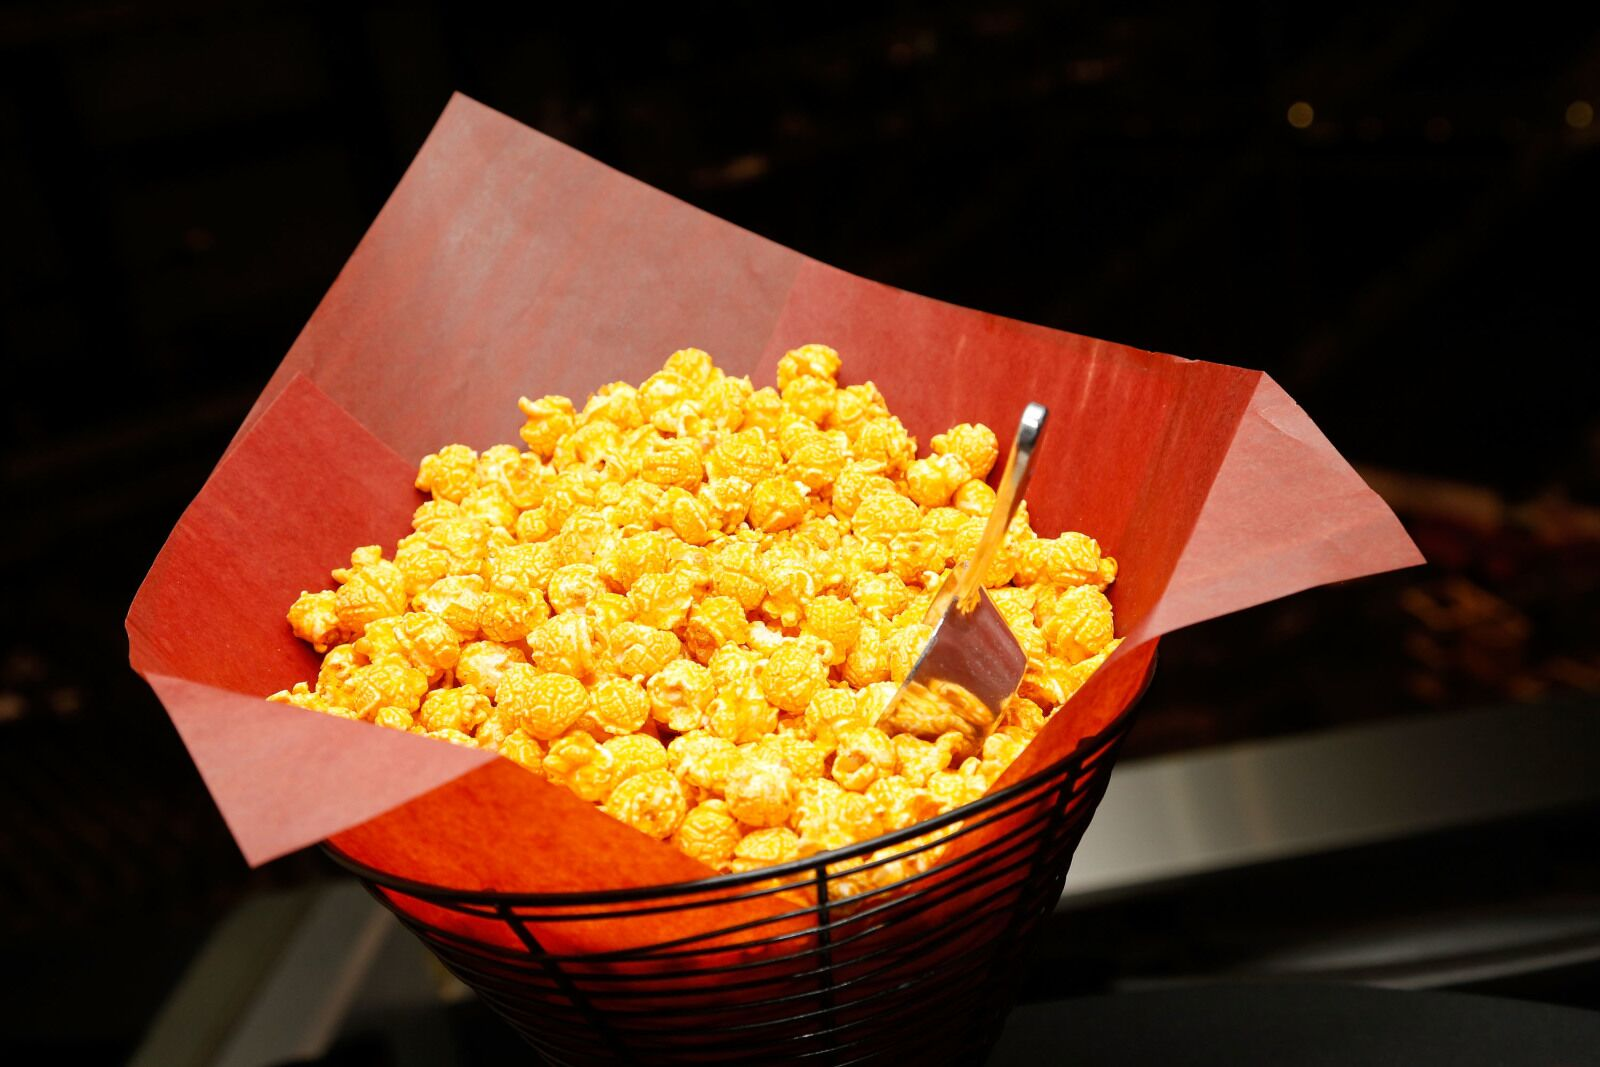 National Popcorn Day: Tasty popcorn snacks that are popping good